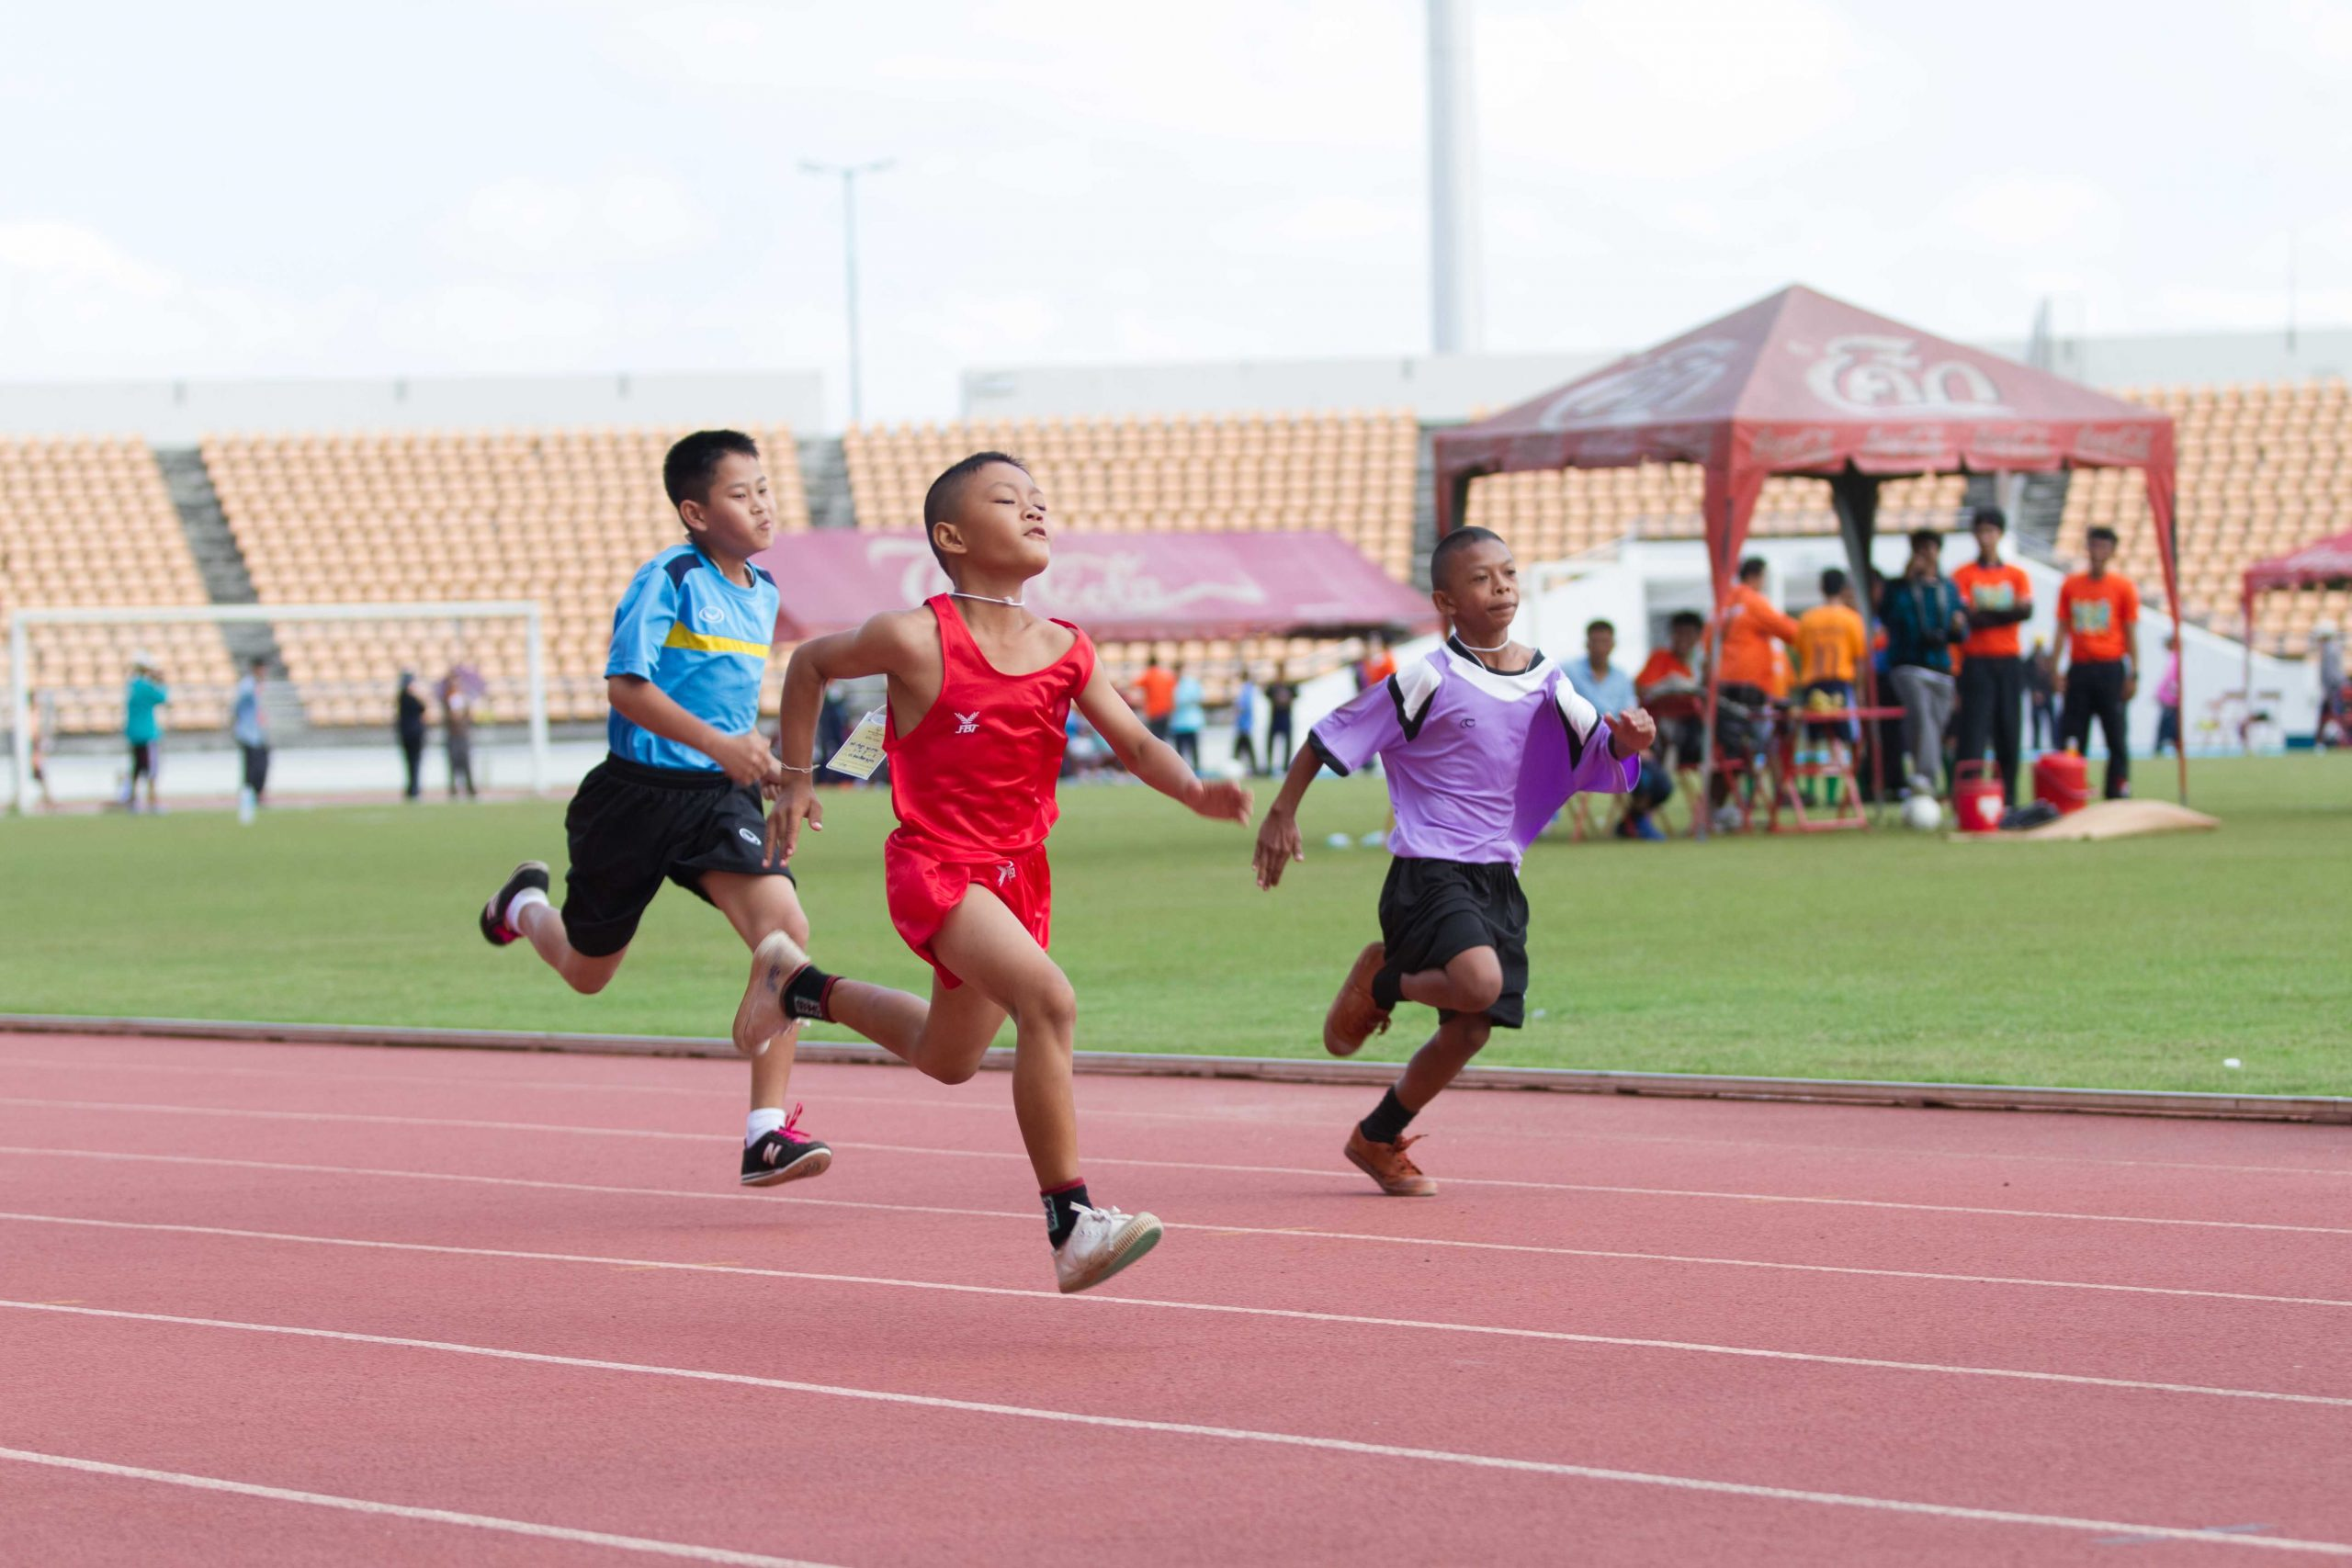 children running track